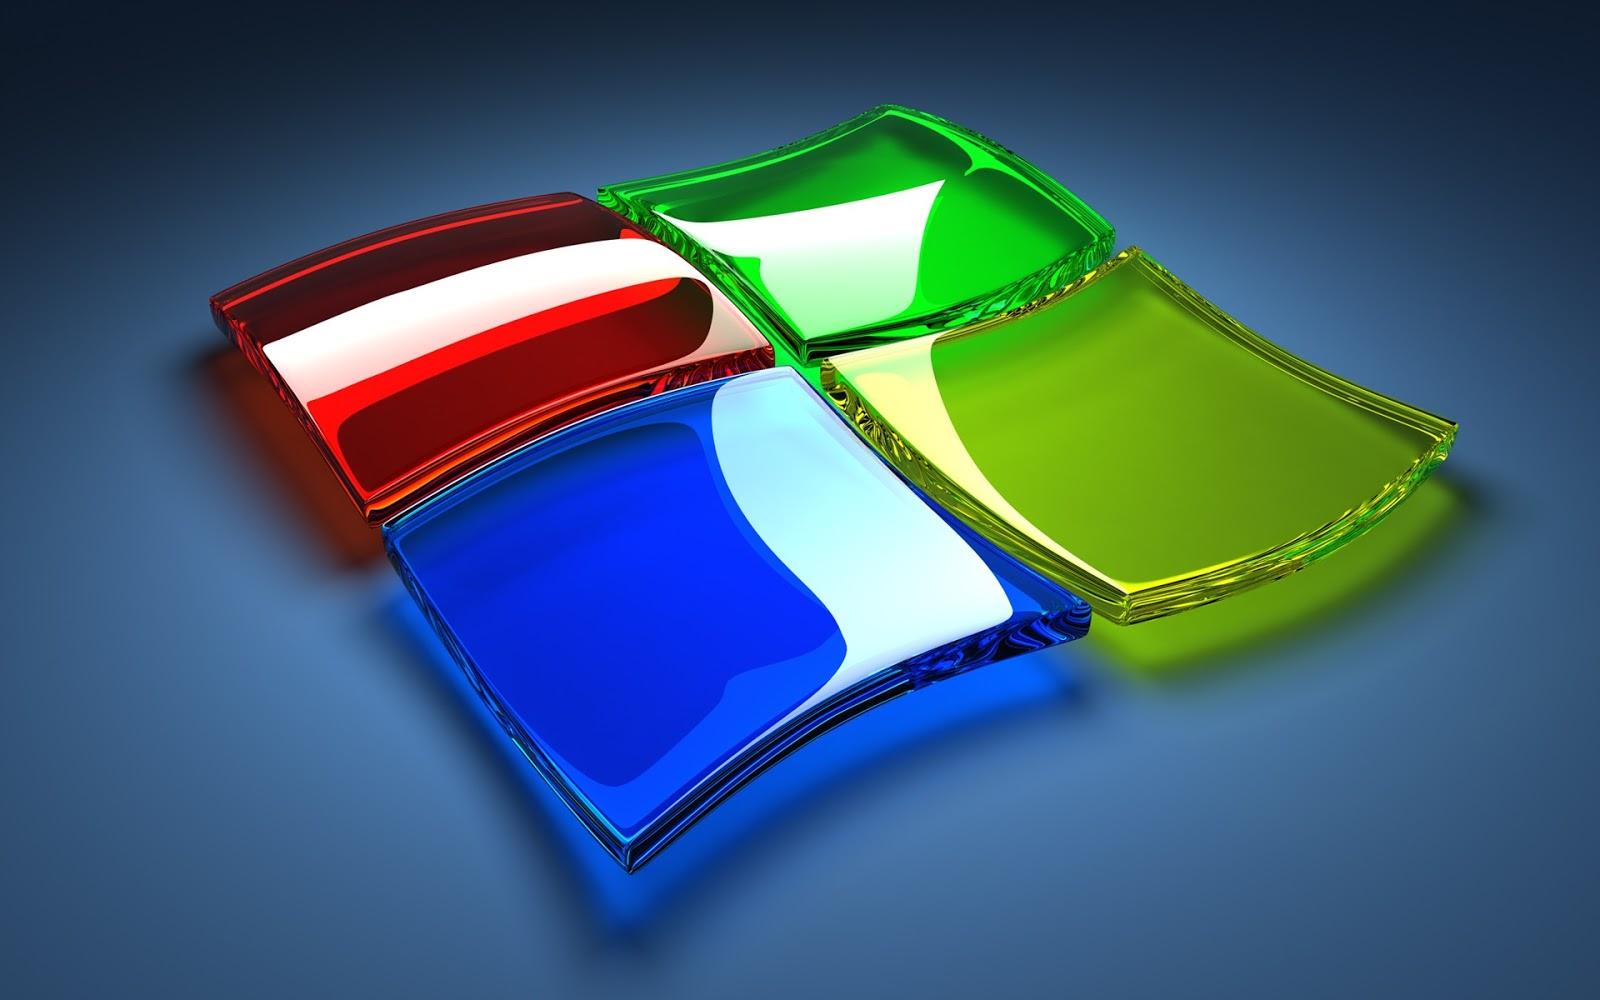 windows xp-windows vista-windows 7-windows 8 hd wallpapers - desktop